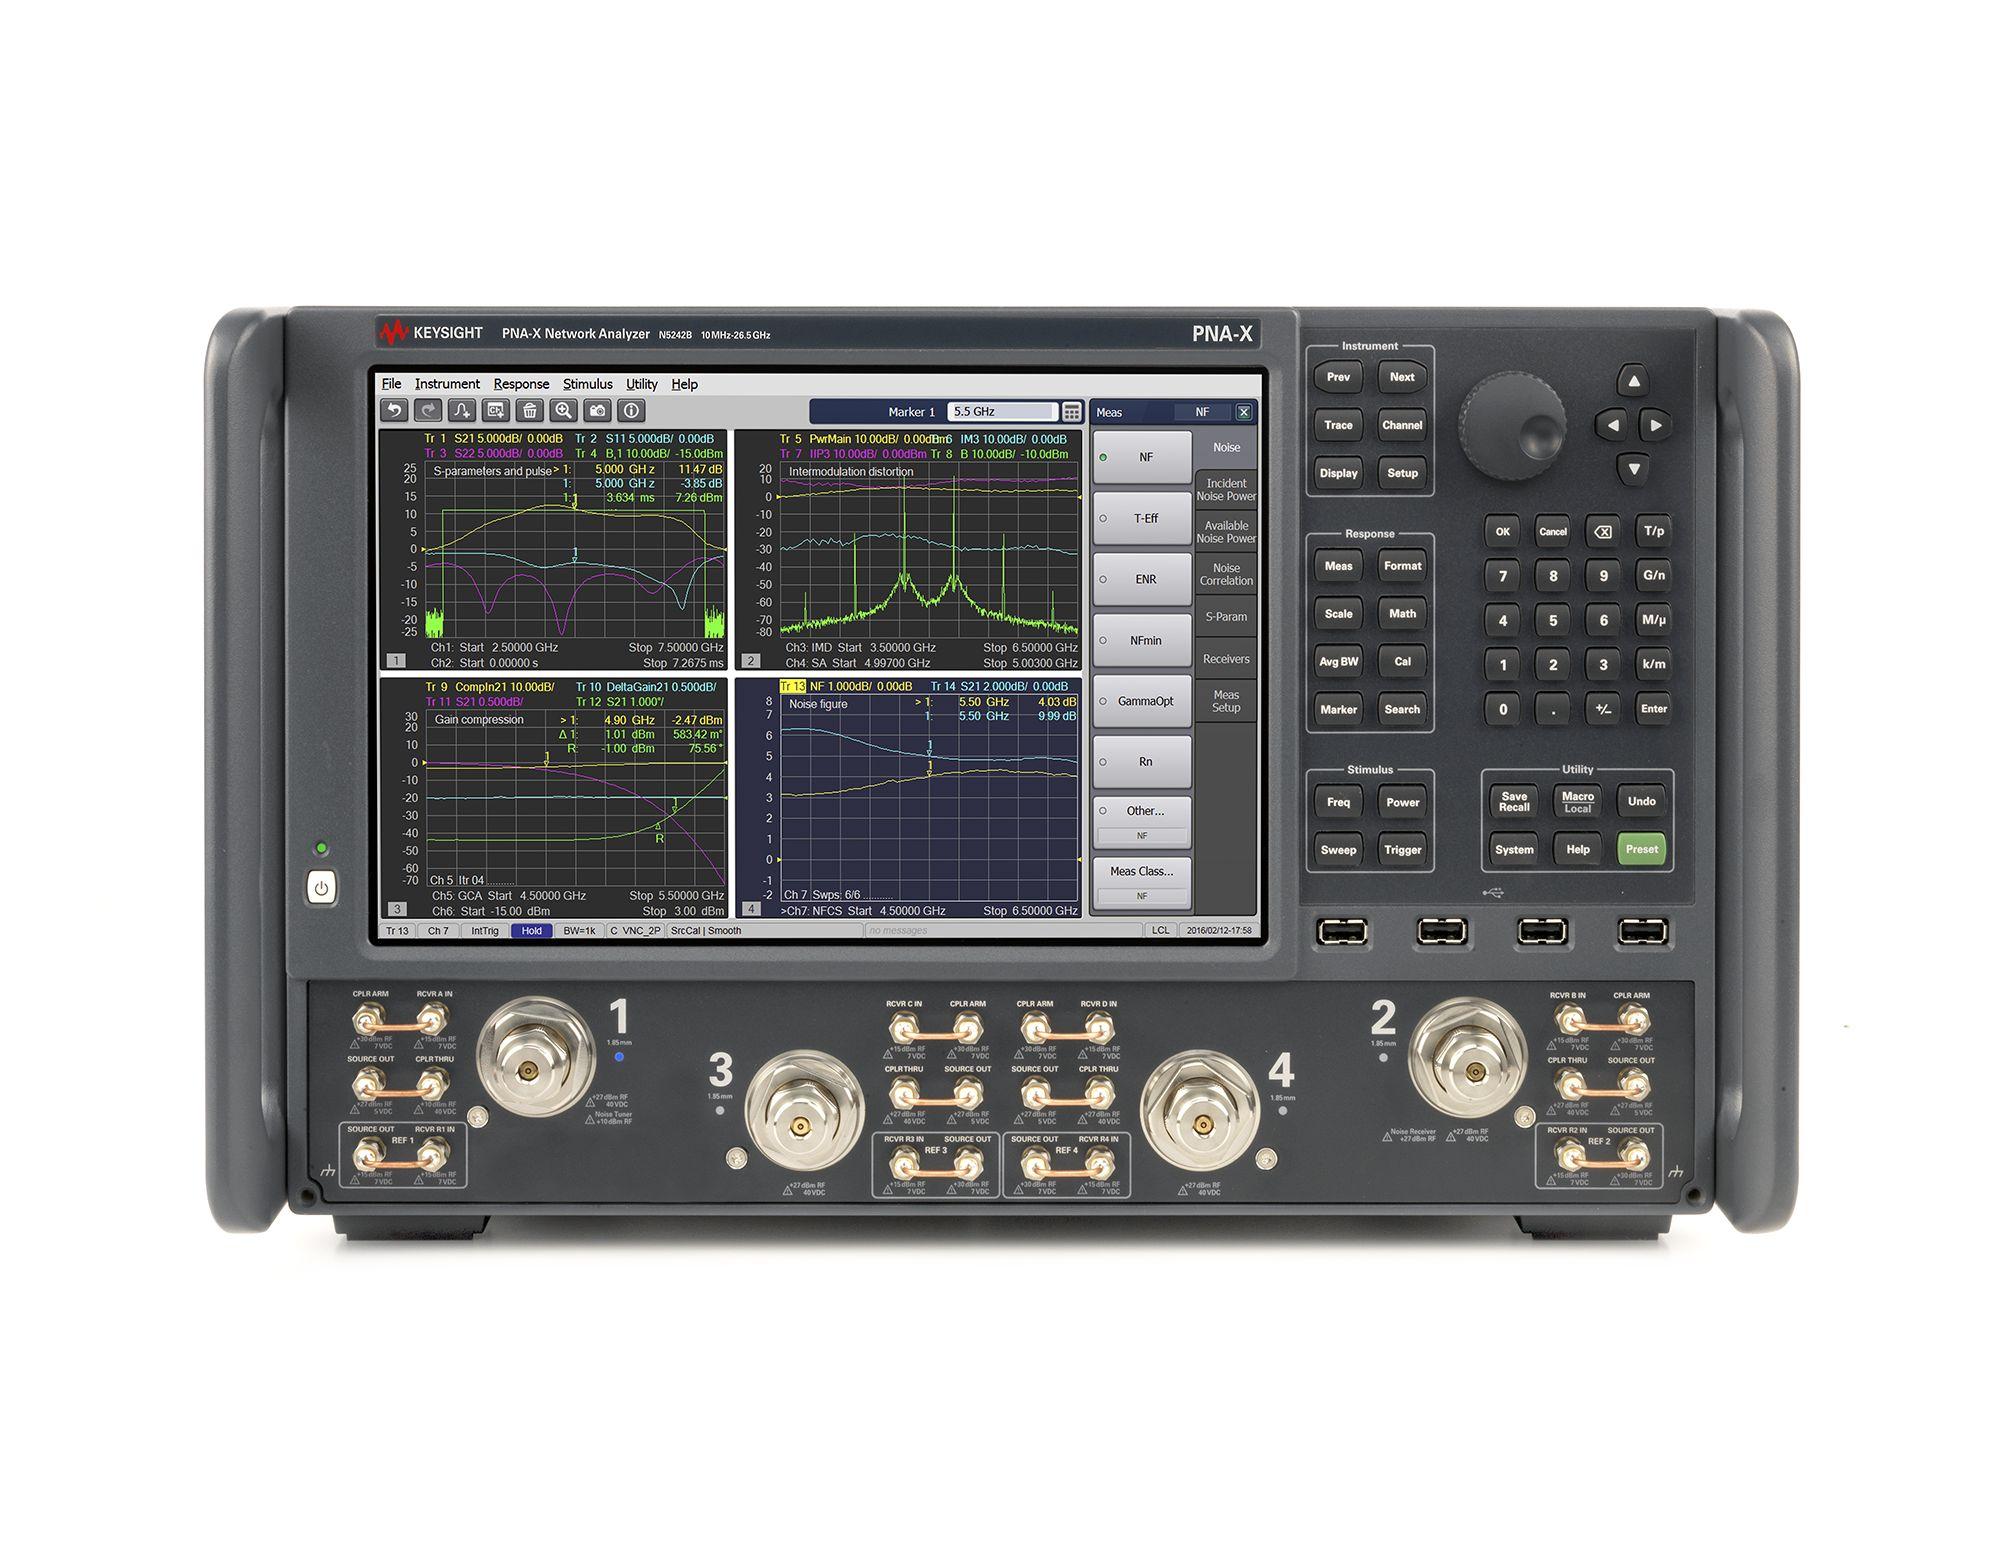 KEYSIGHT N5242B PNA-X 微波网络分析仪